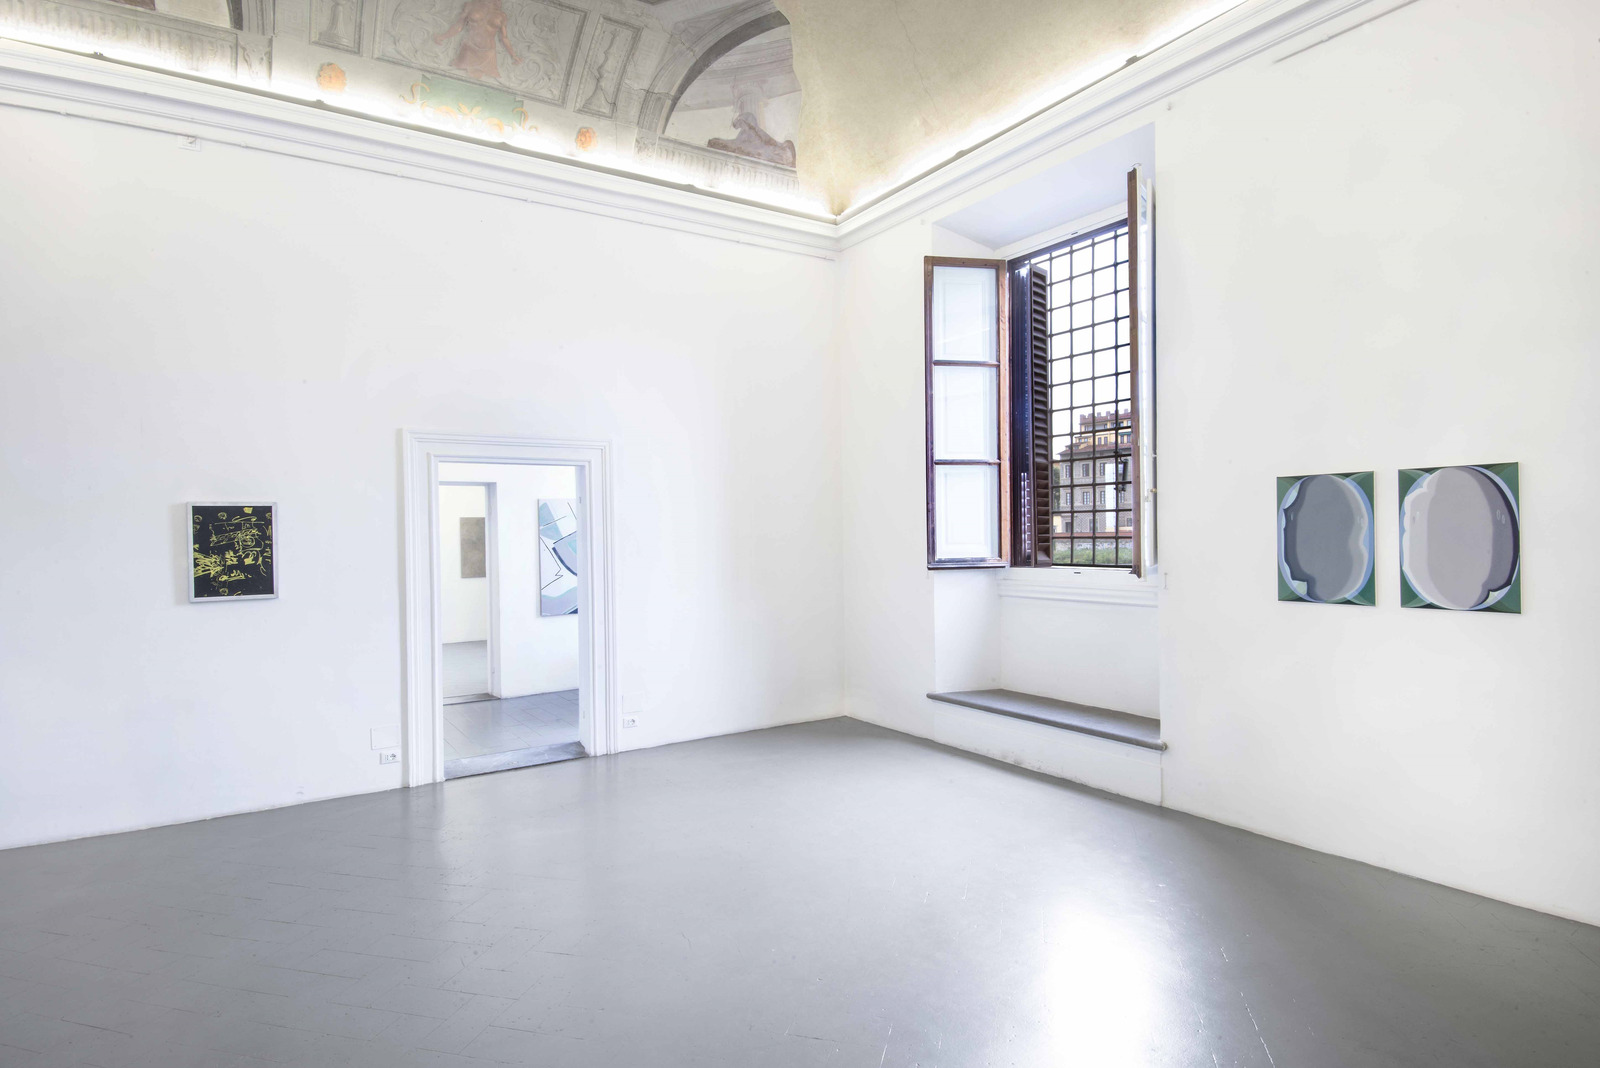 8.Installation View, Sofia Leiby, Hanna Hur, Zoé de Soumagnat, Heather Guertin. Courtesy of Eduardo Secci Contemporary